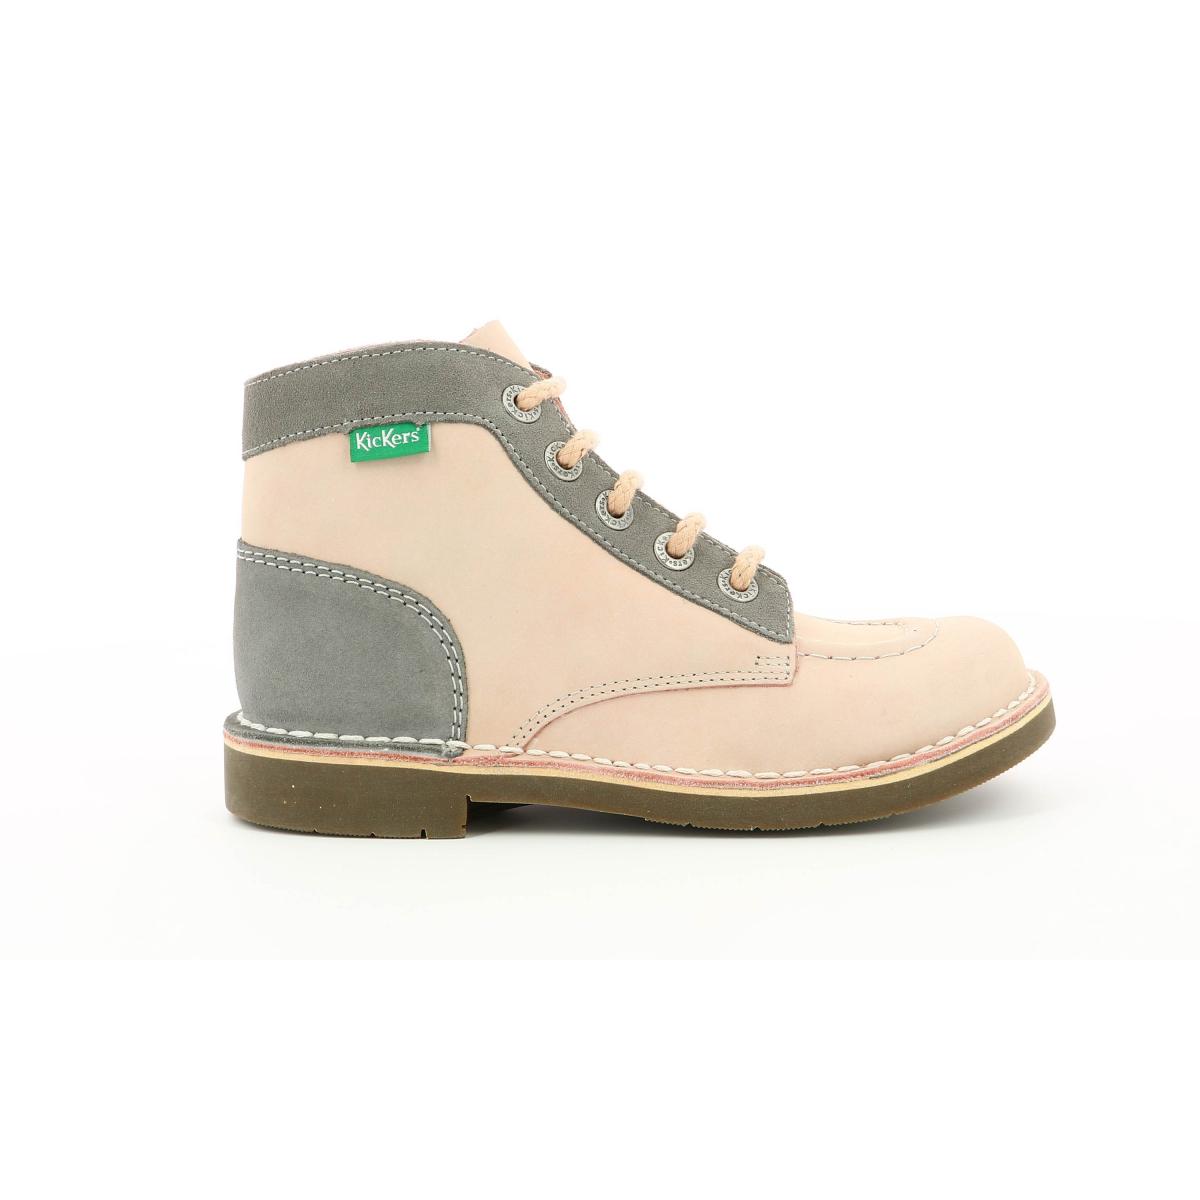 Chaussures Enfant KICK COL ROSE CLAIR Kickers